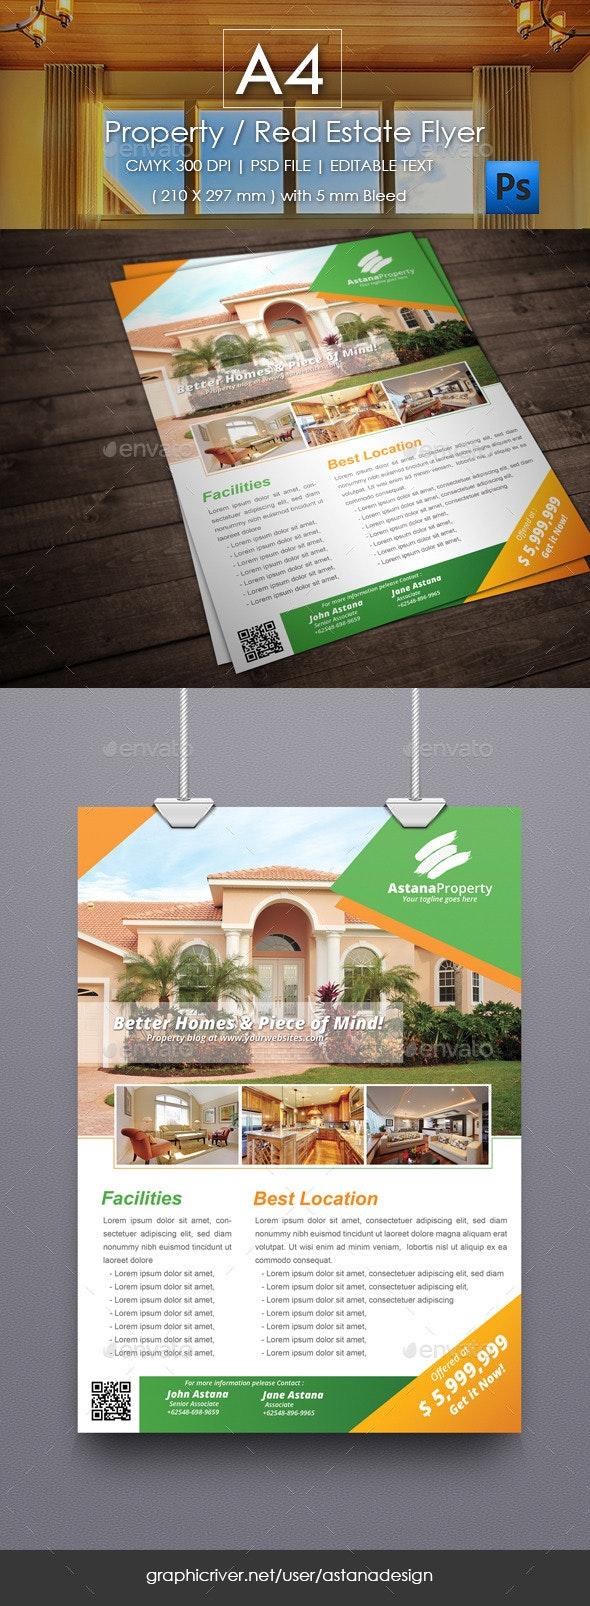 Property / Real Estate Flyer - Commerce Flyers